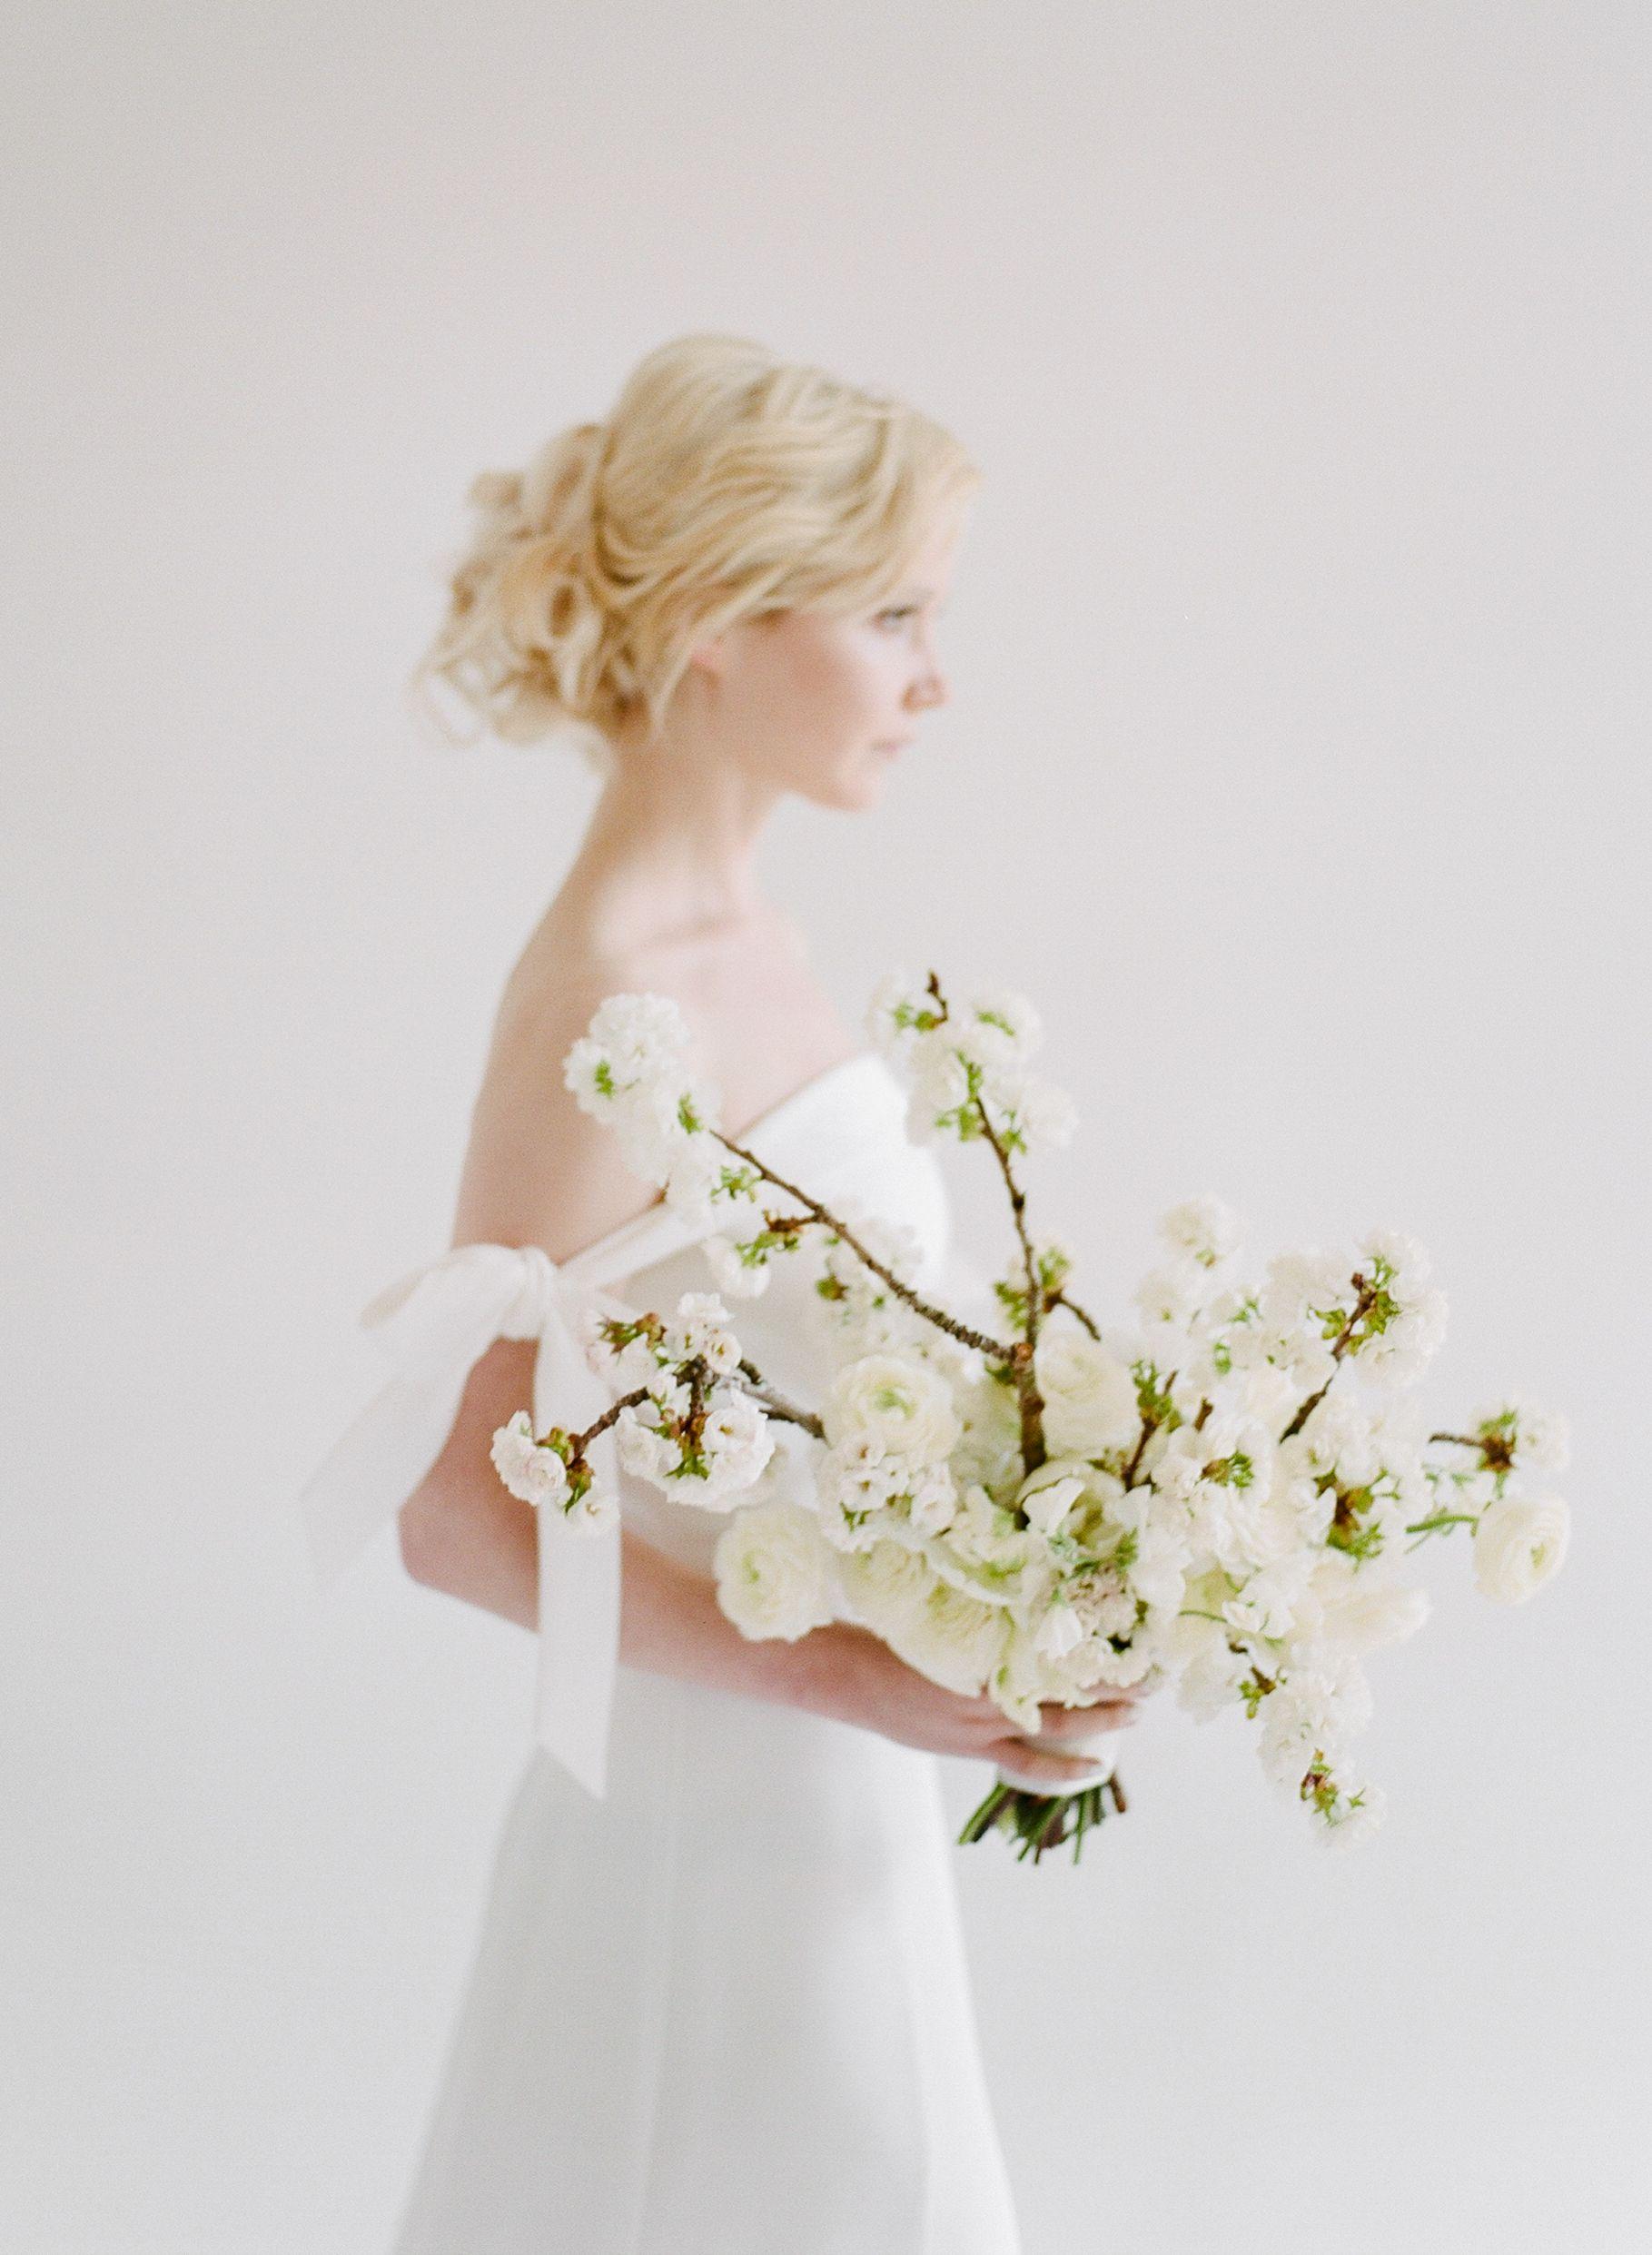 Winter Wedding Bouquets.Winter Wedding Flower Ideas Bridal Bouquet Ideas For